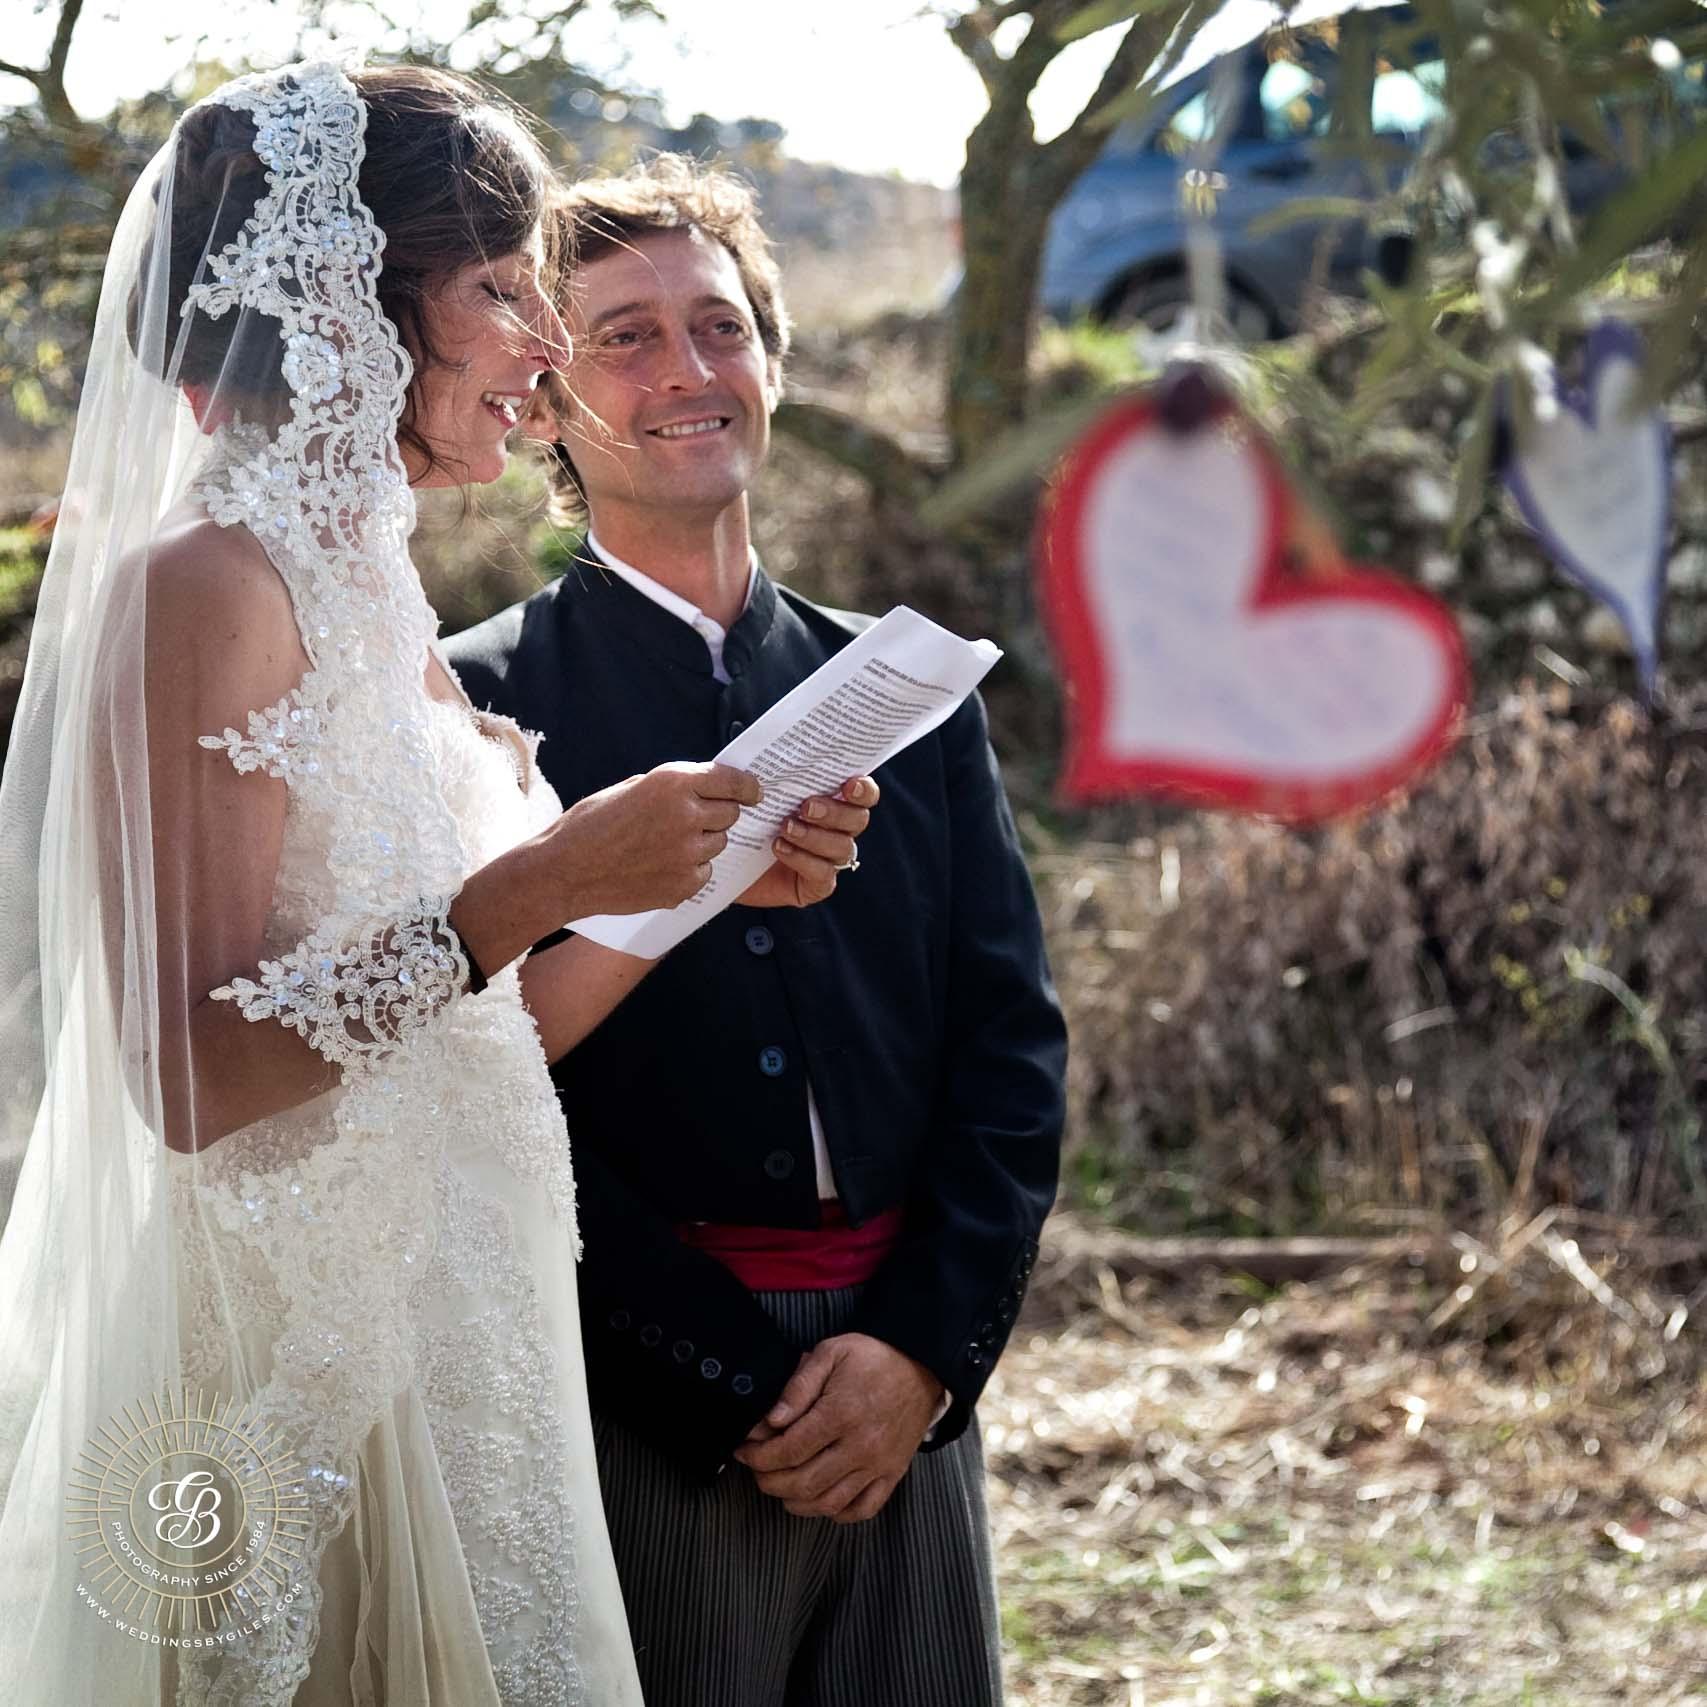 The brides wedding vows